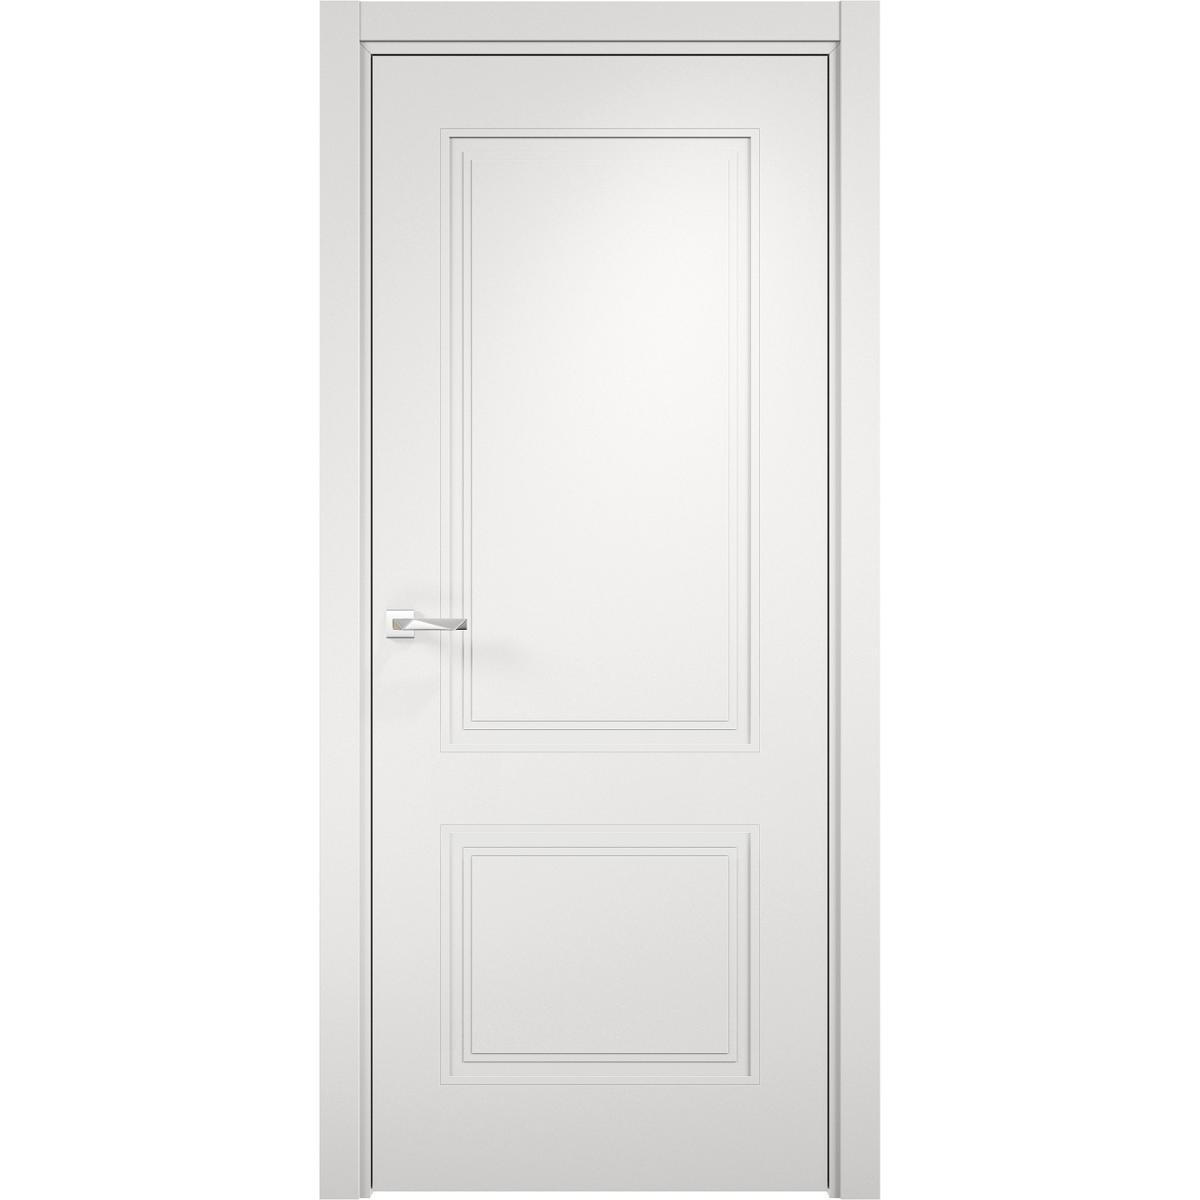 Дверное полотно Loyard Ларедо МП_0318 2000х700х44 мм МДФ